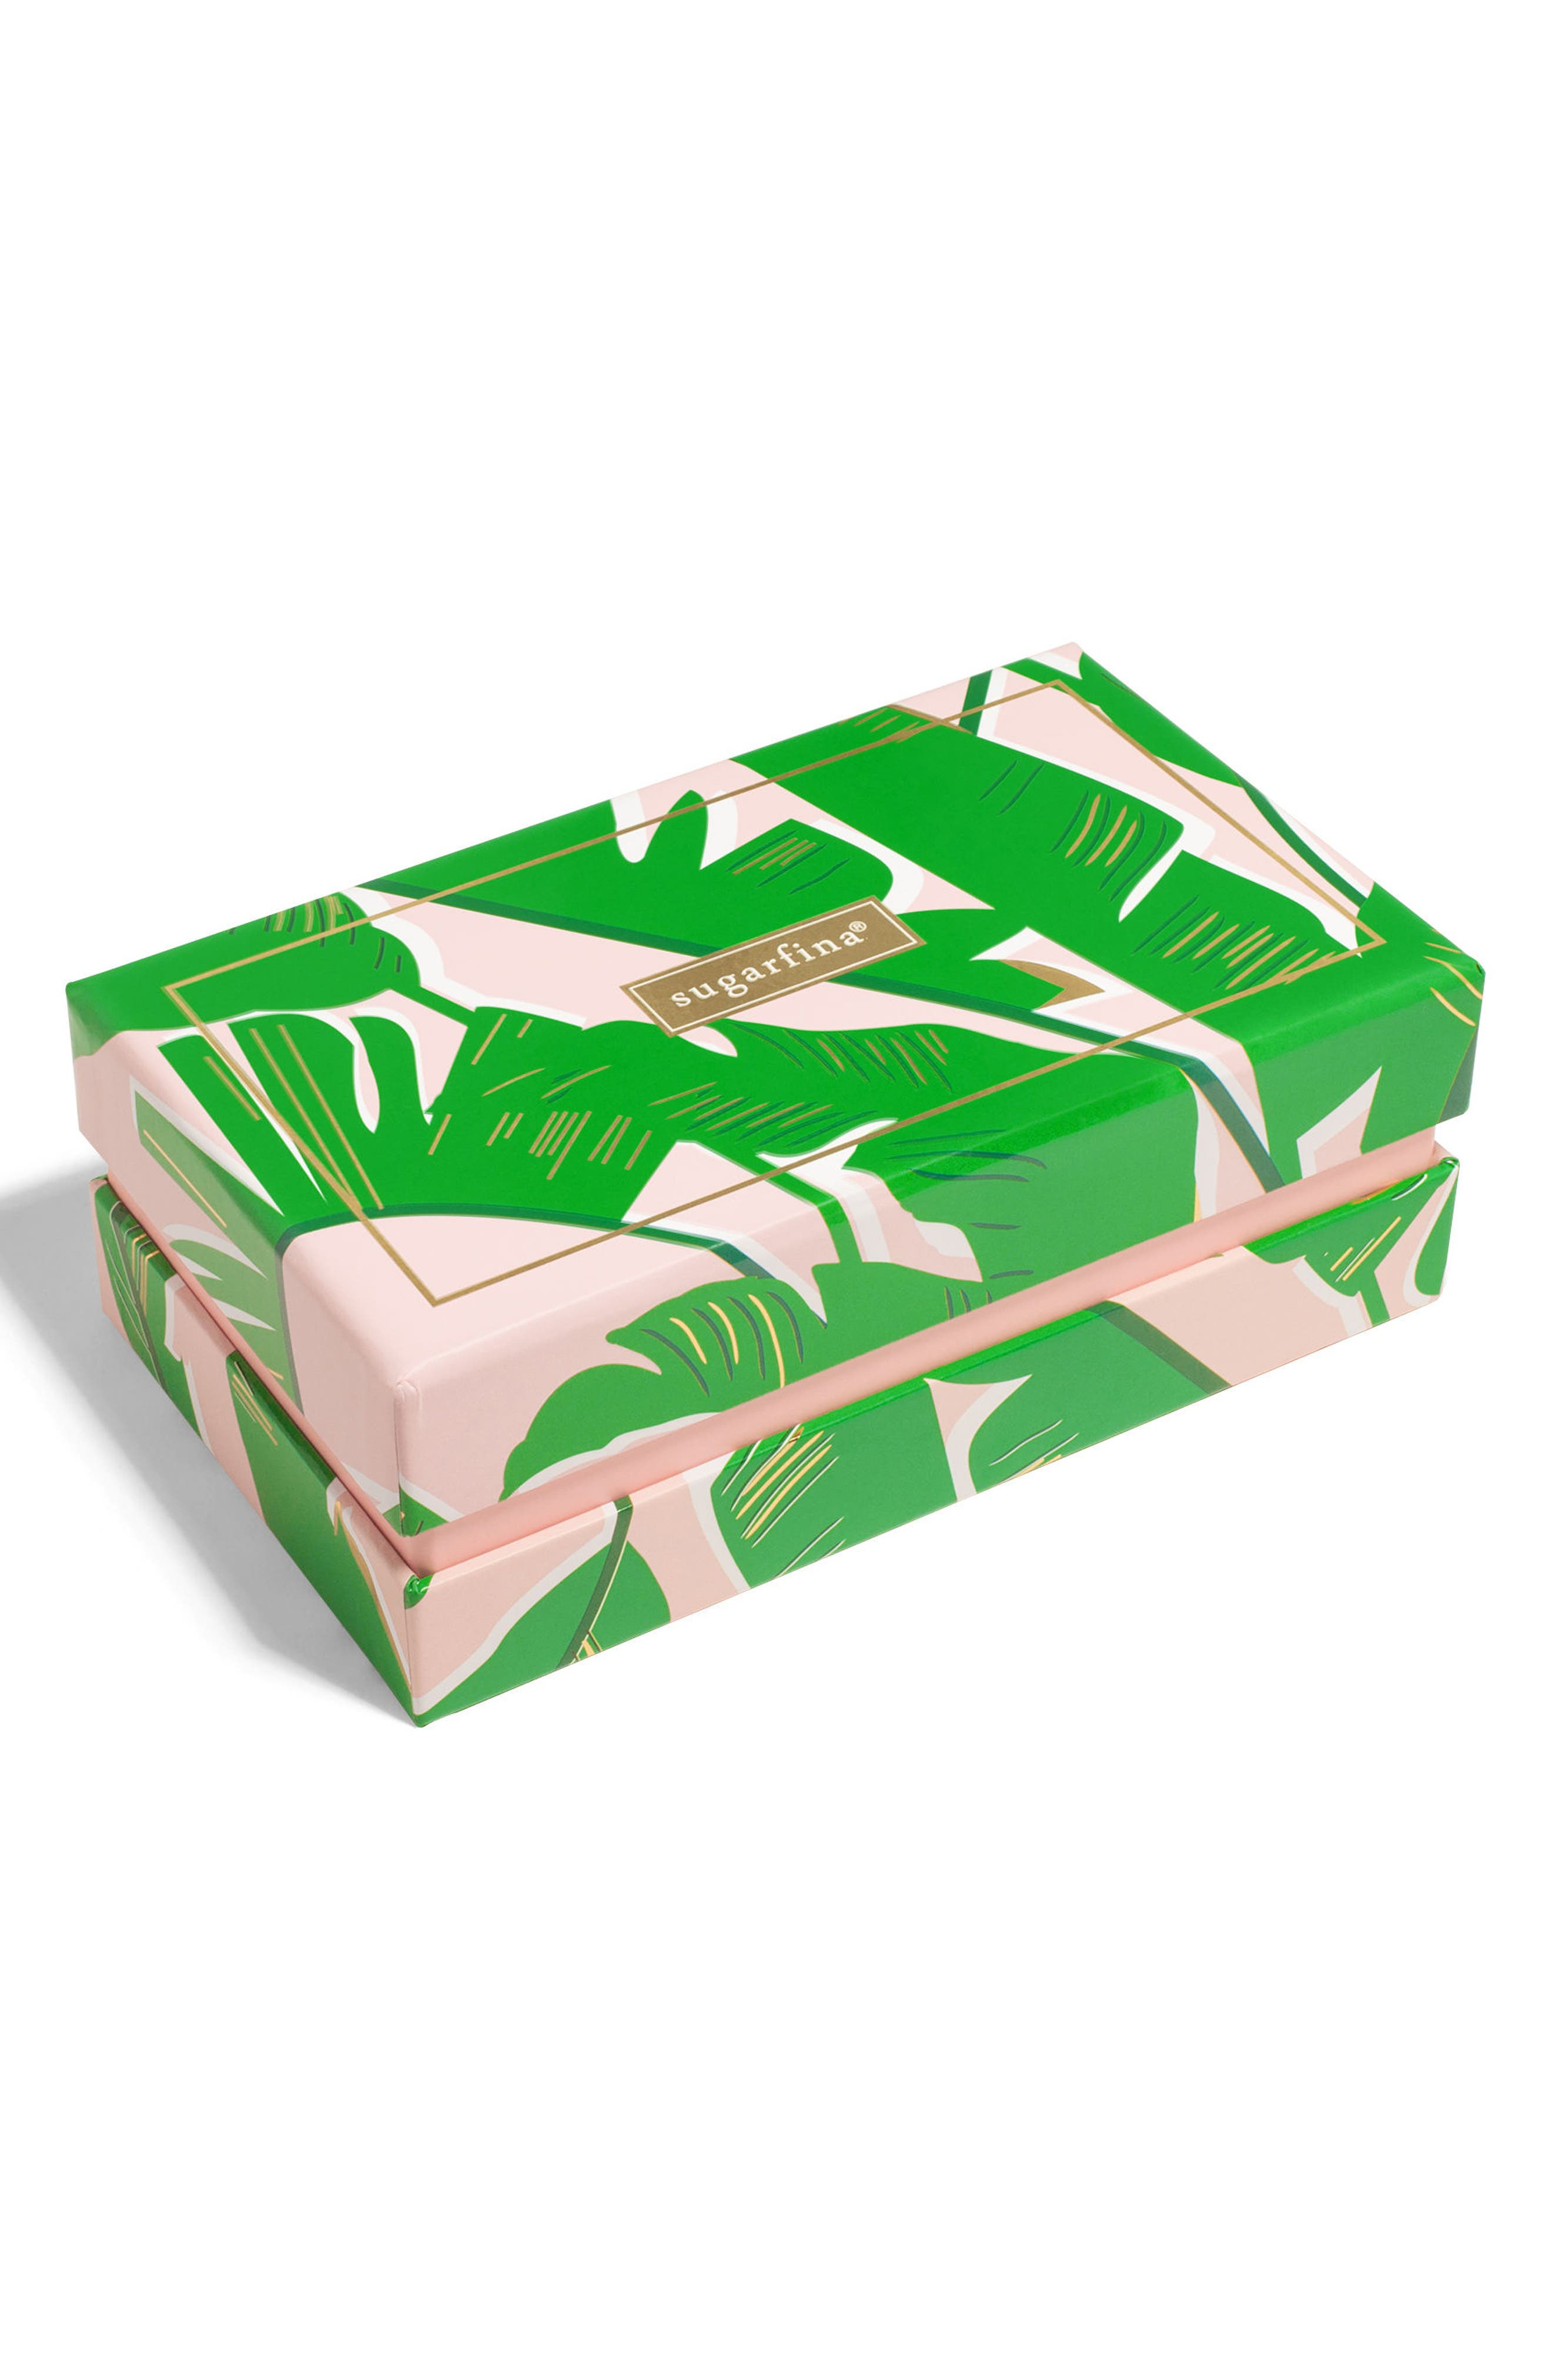 Taste of Paradise 2-Piece Candy Bento Box,                             Alternate thumbnail 2, color,                             650